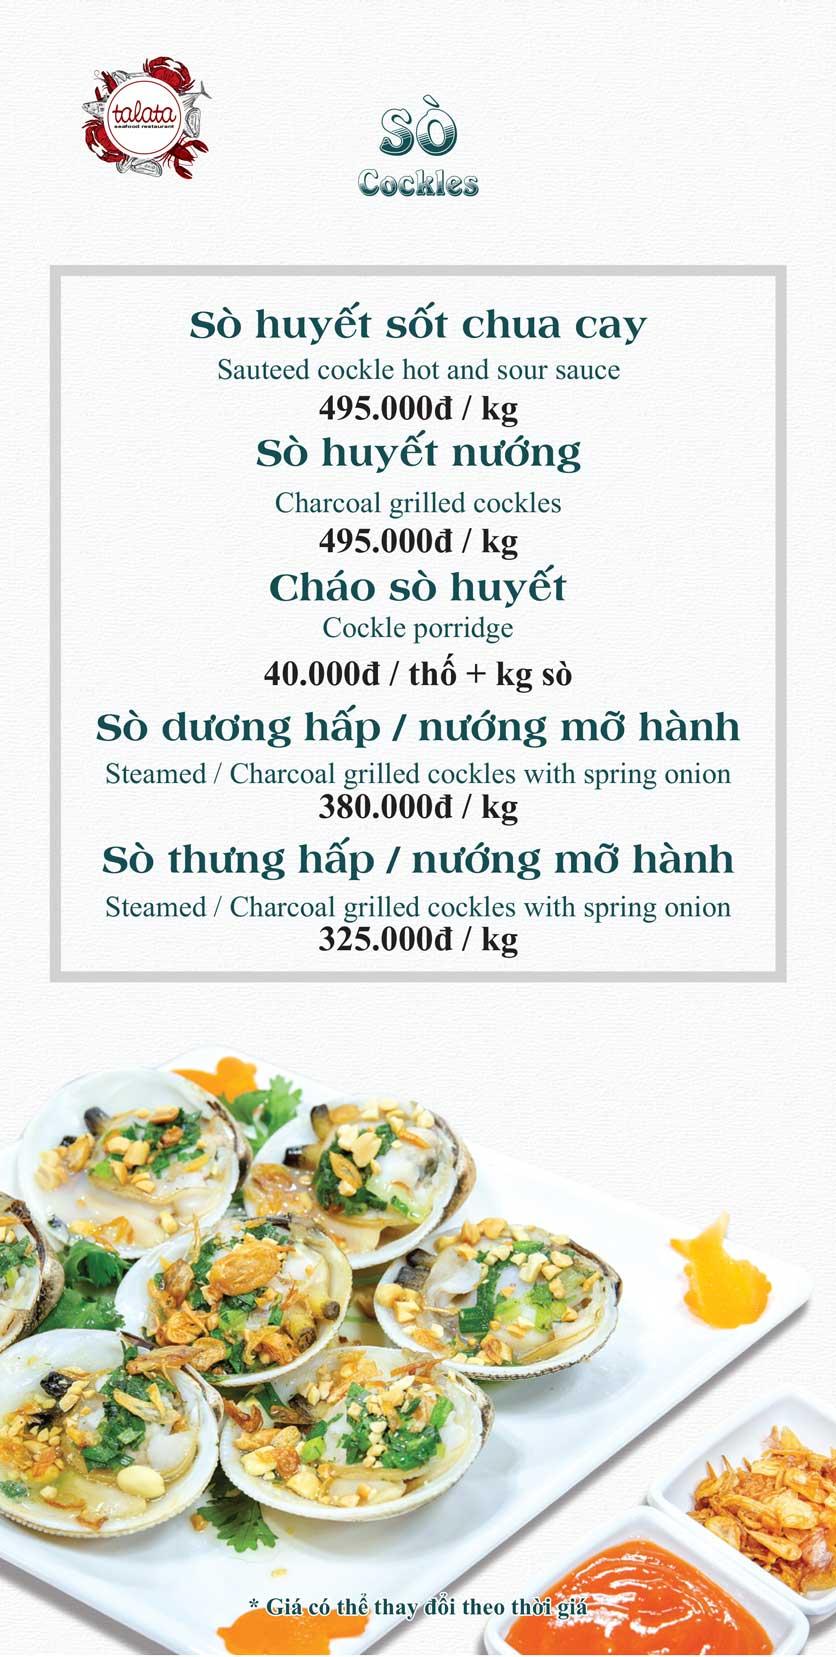 Menu Hải Sản Talata - Huỳnh Thúc Kháng 6